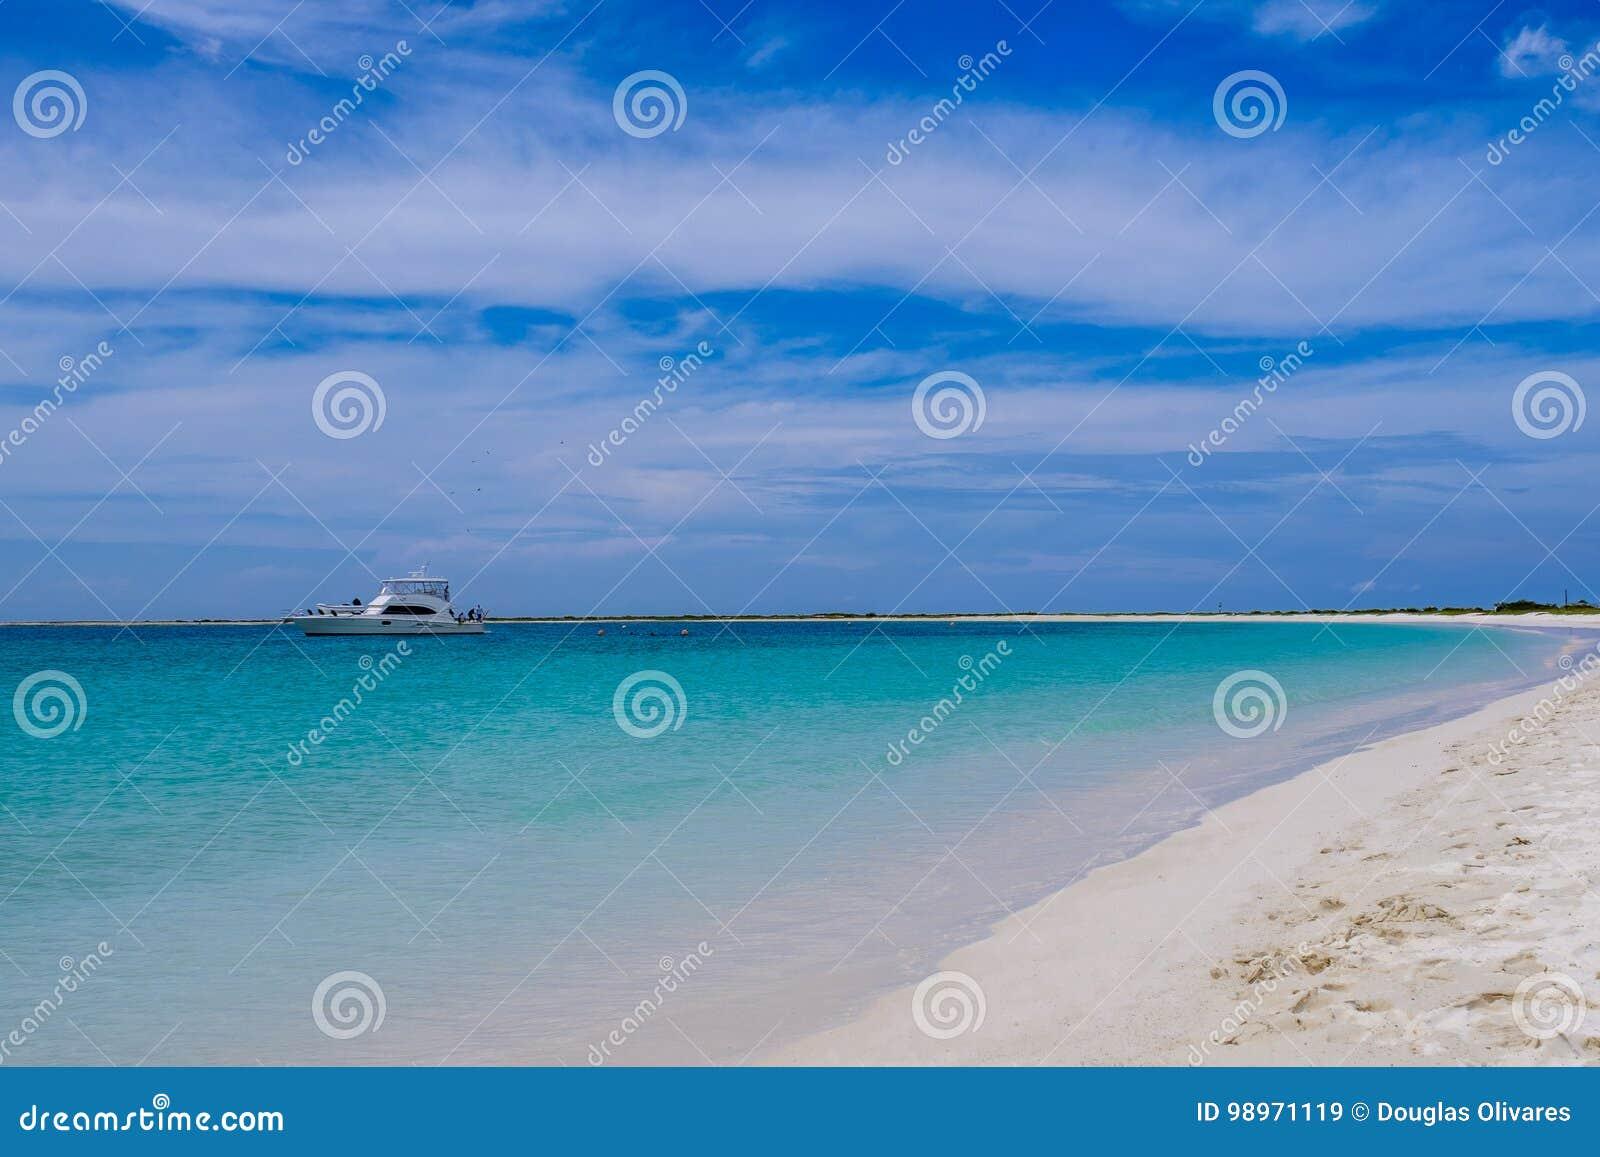 Spasstag Am Strand Tortuga Insel Venezuela Stockbild Bild Von